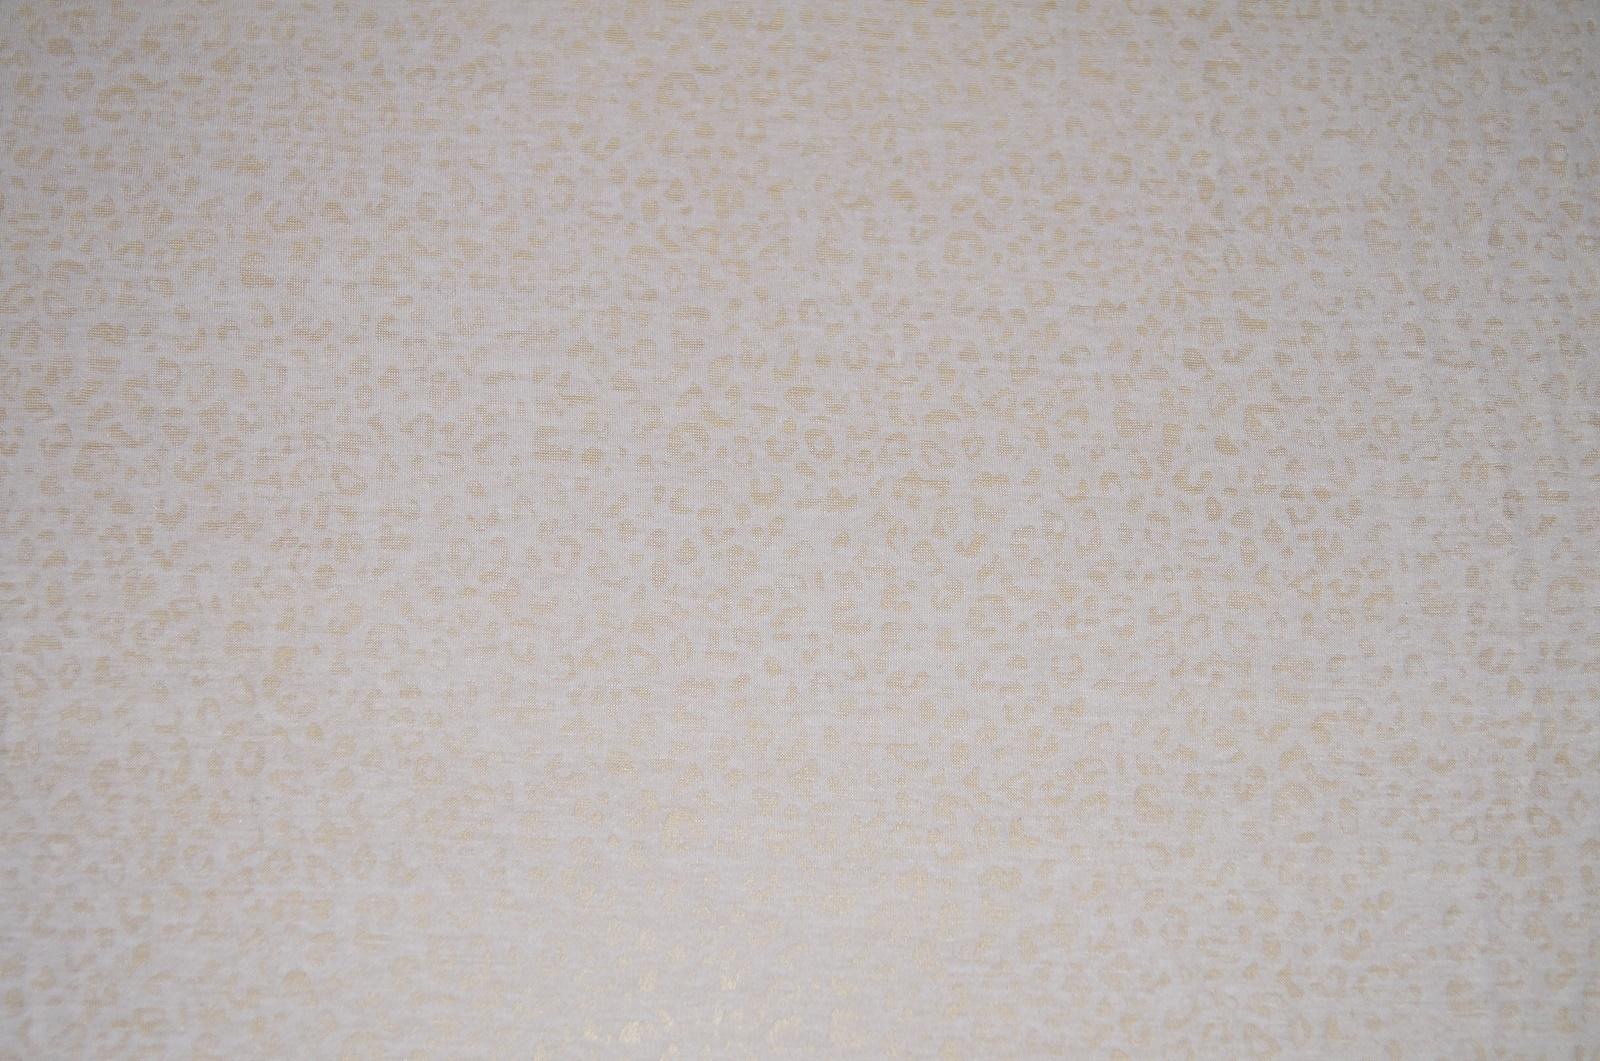 stoffe jersey stretch stoff wollweiss ausbrenner leomuster. Black Bedroom Furniture Sets. Home Design Ideas